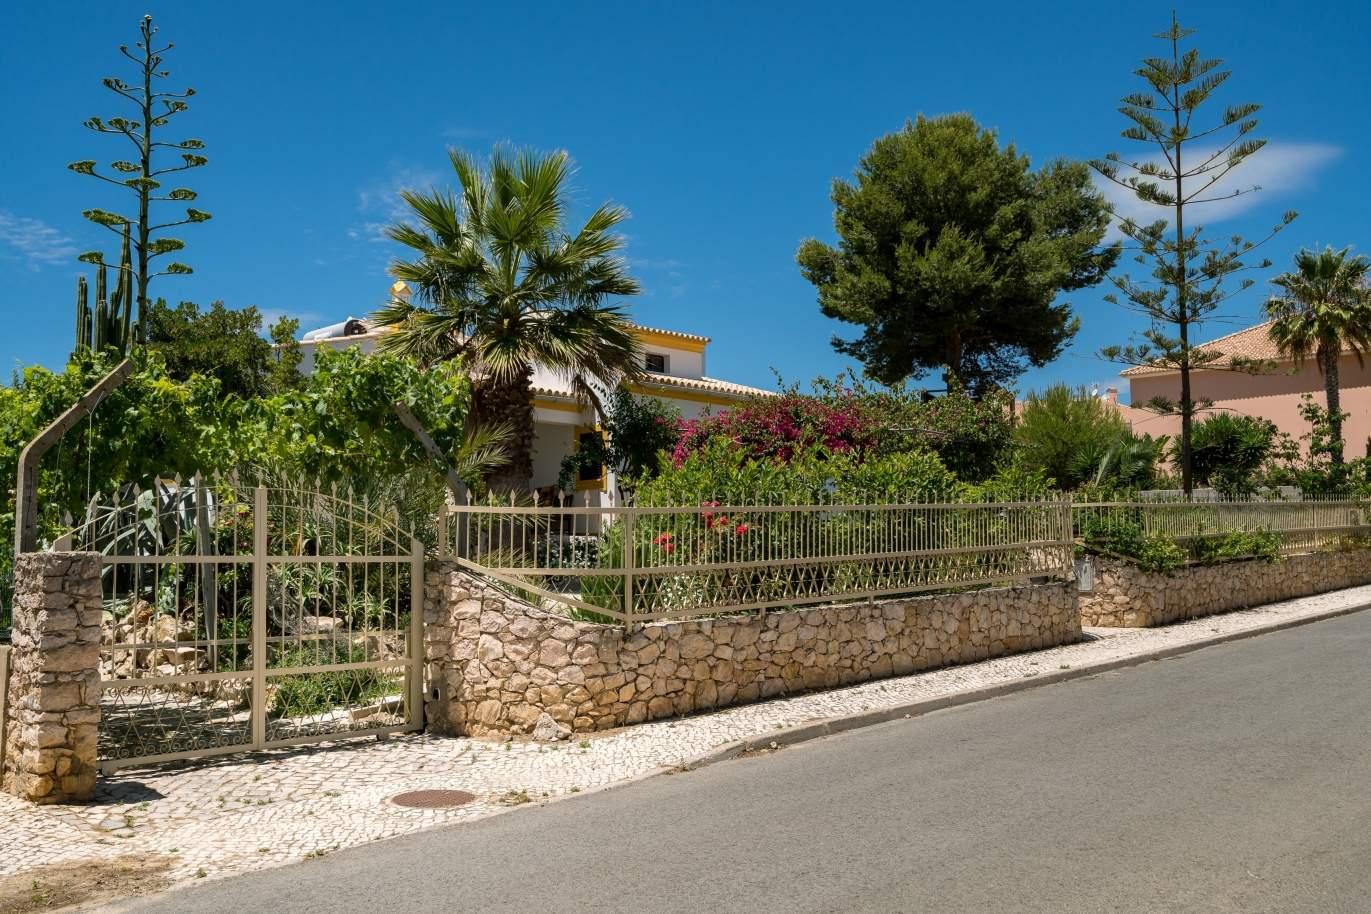 4-bedroom-villa-with-plot-of-land-sale-albufeira-algarve-portugal